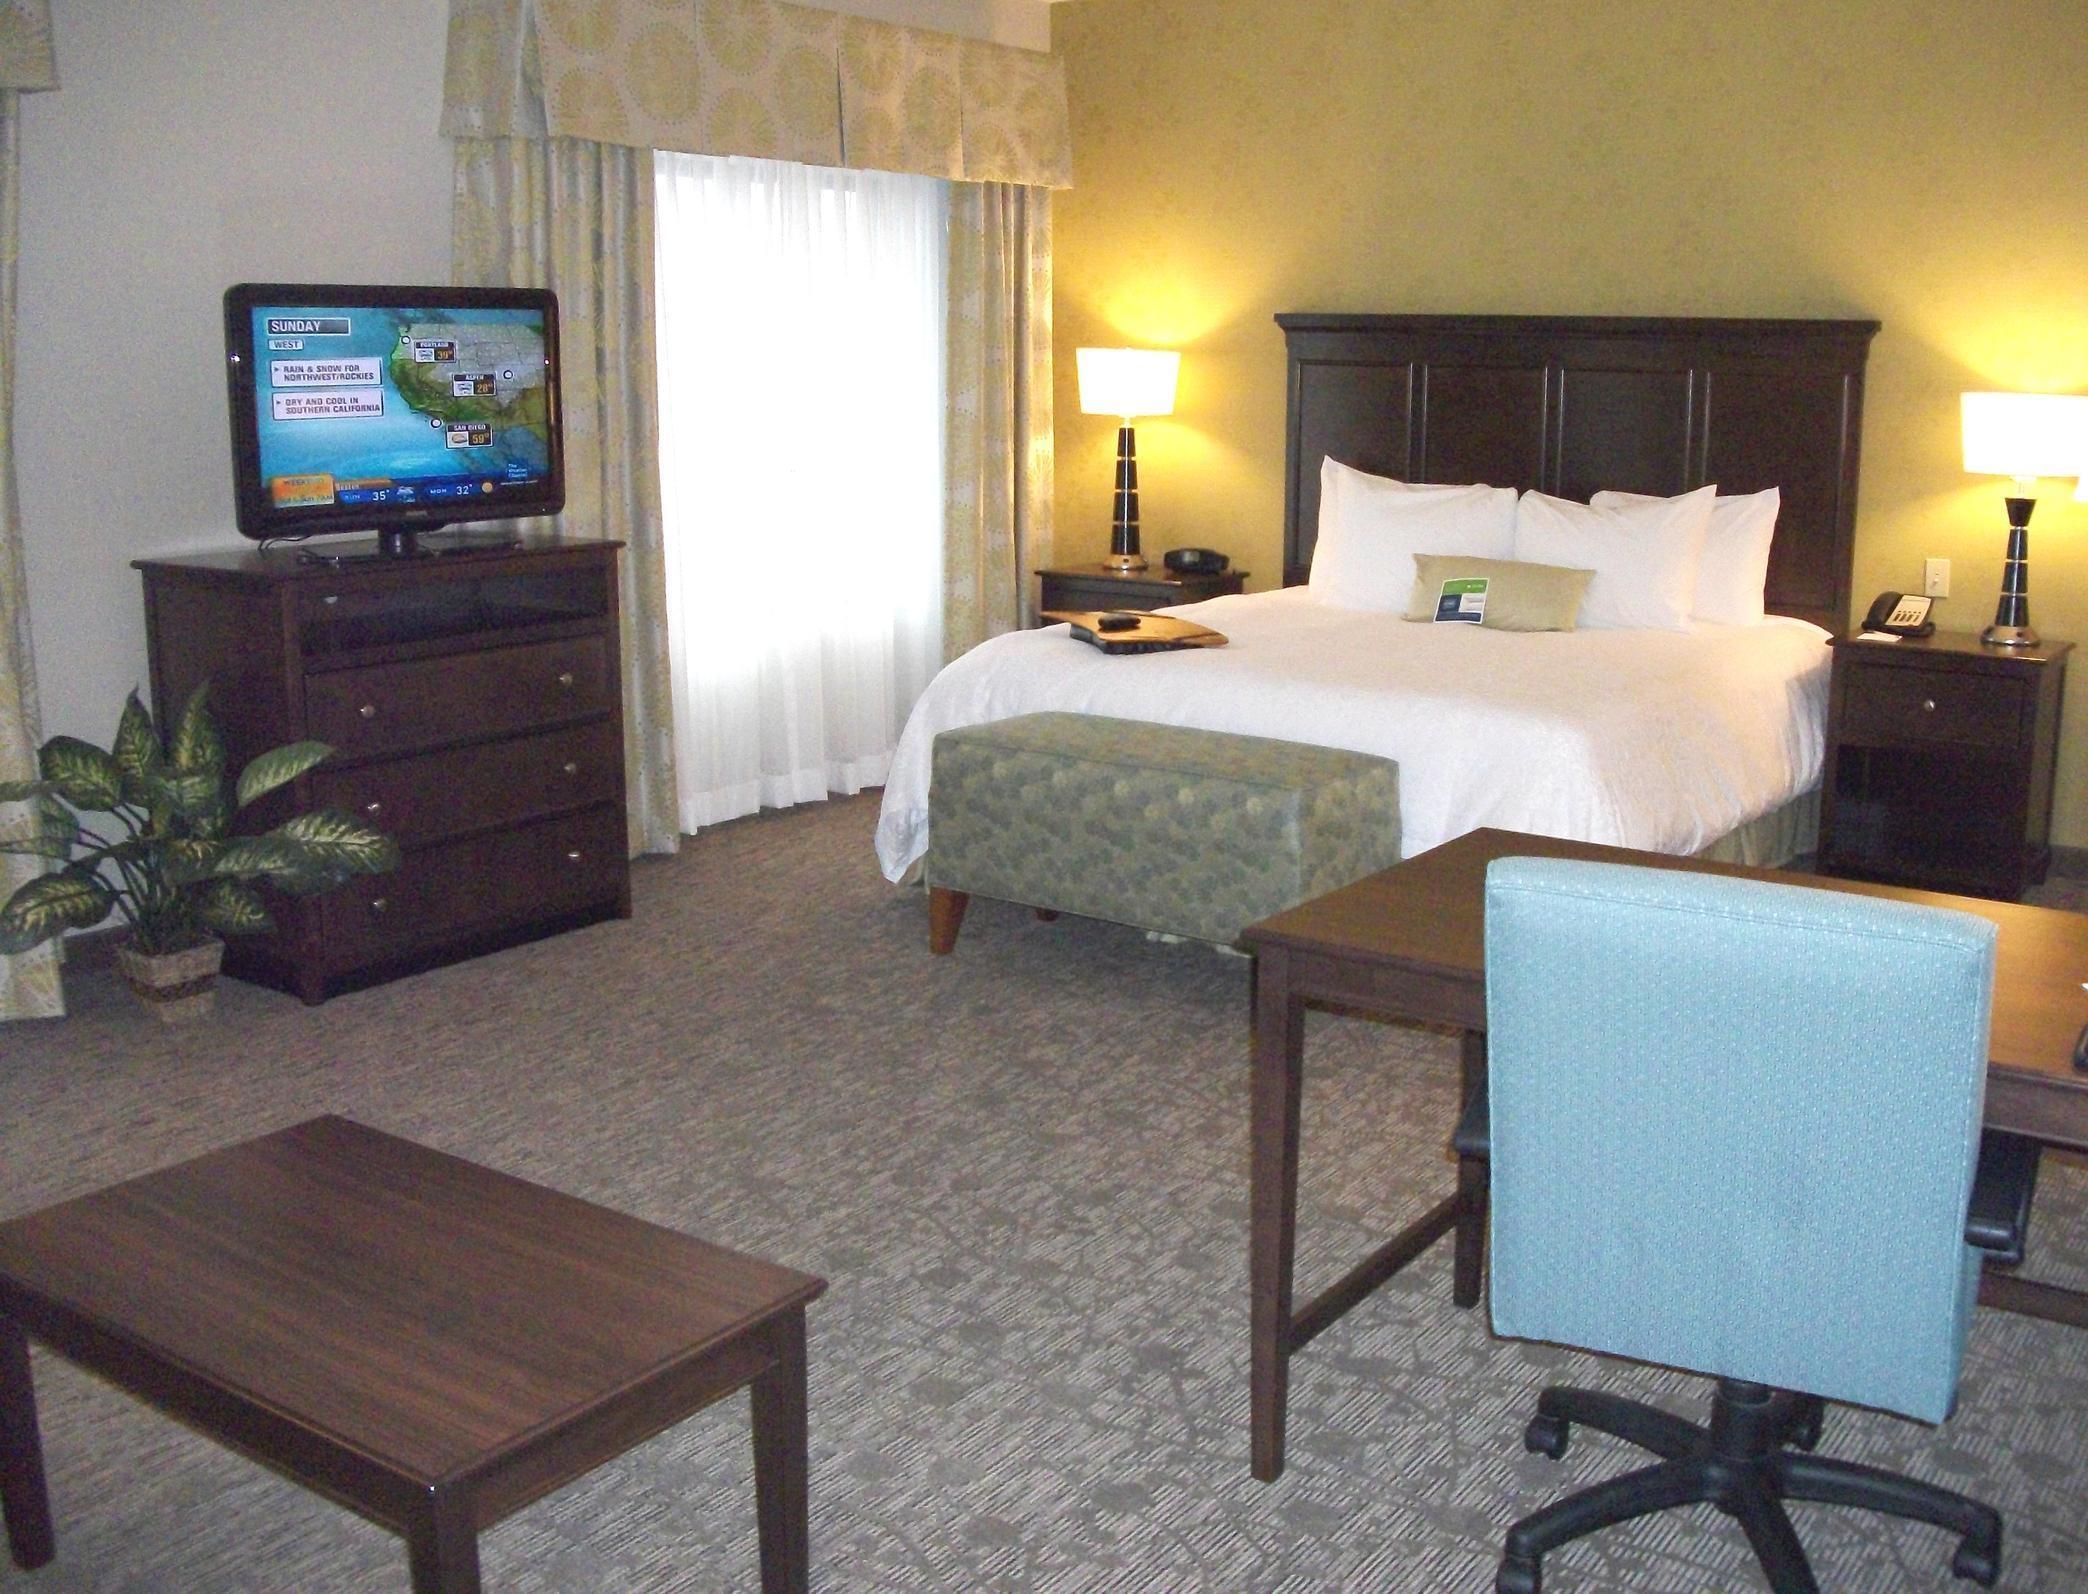 Hampton Inn & Suites Manteca image 19